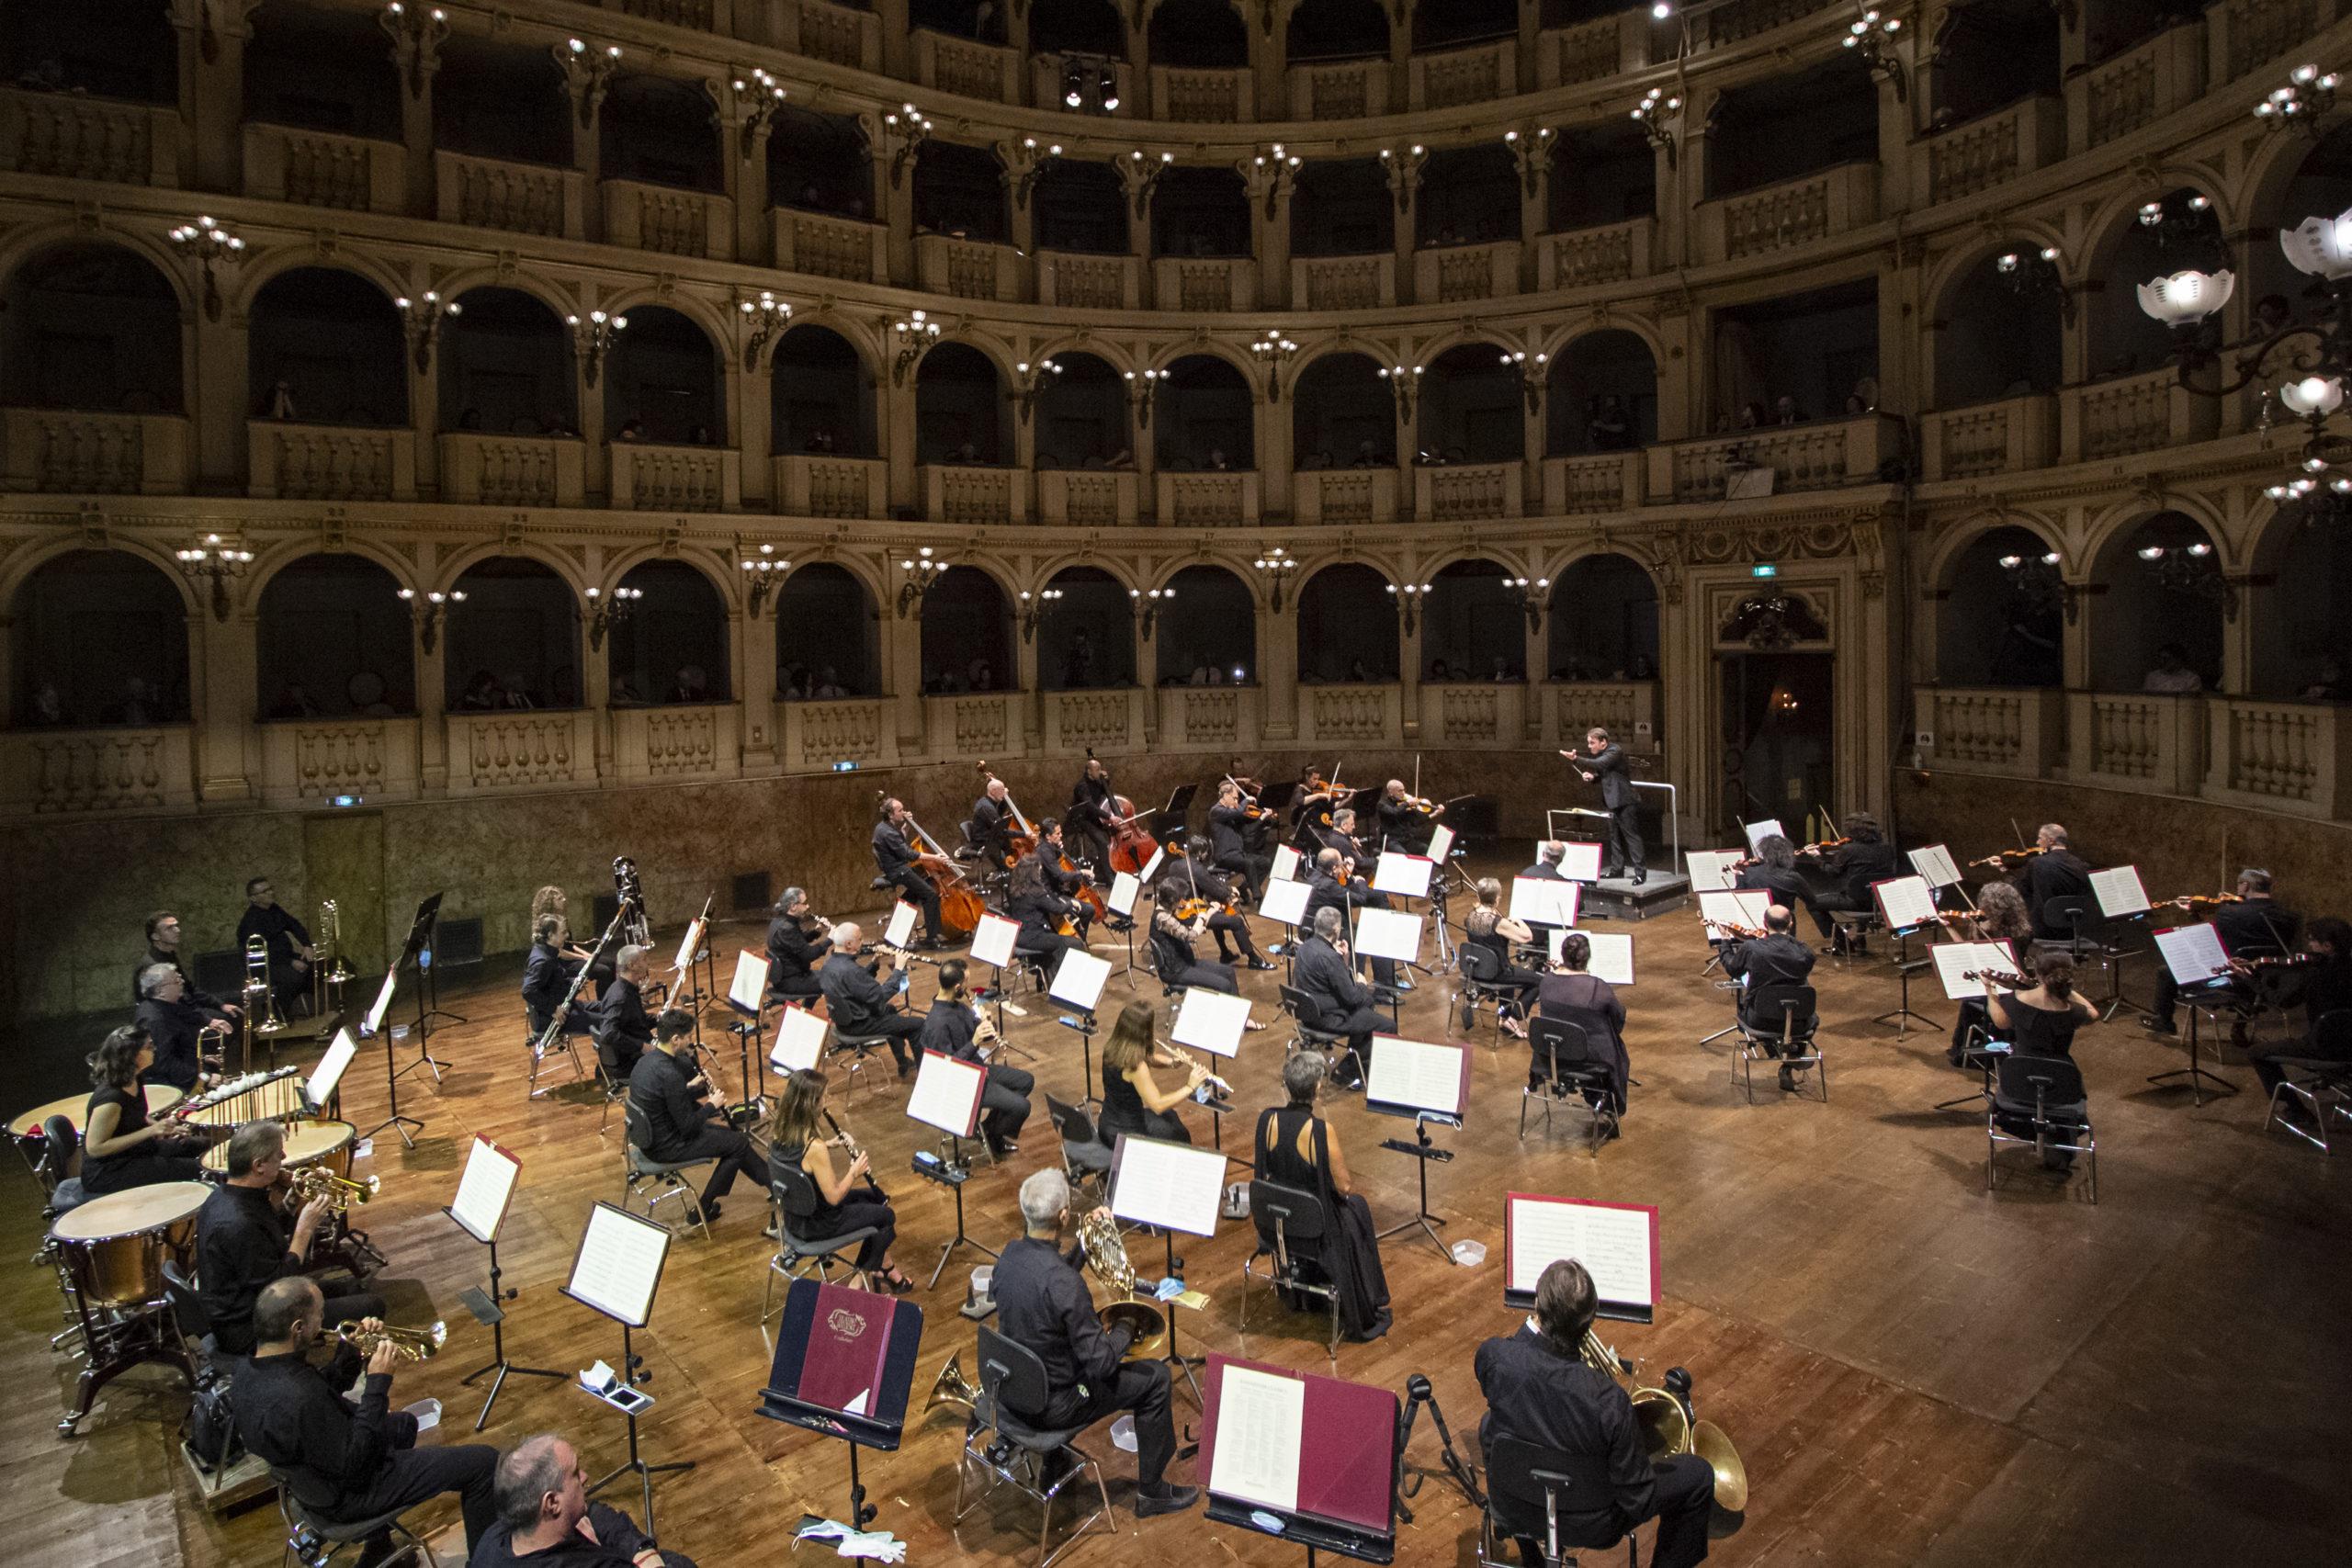 Sinfonica_2020-02-17_MG_9708_©AndreaRanzi (Casaluci-Ranzi)